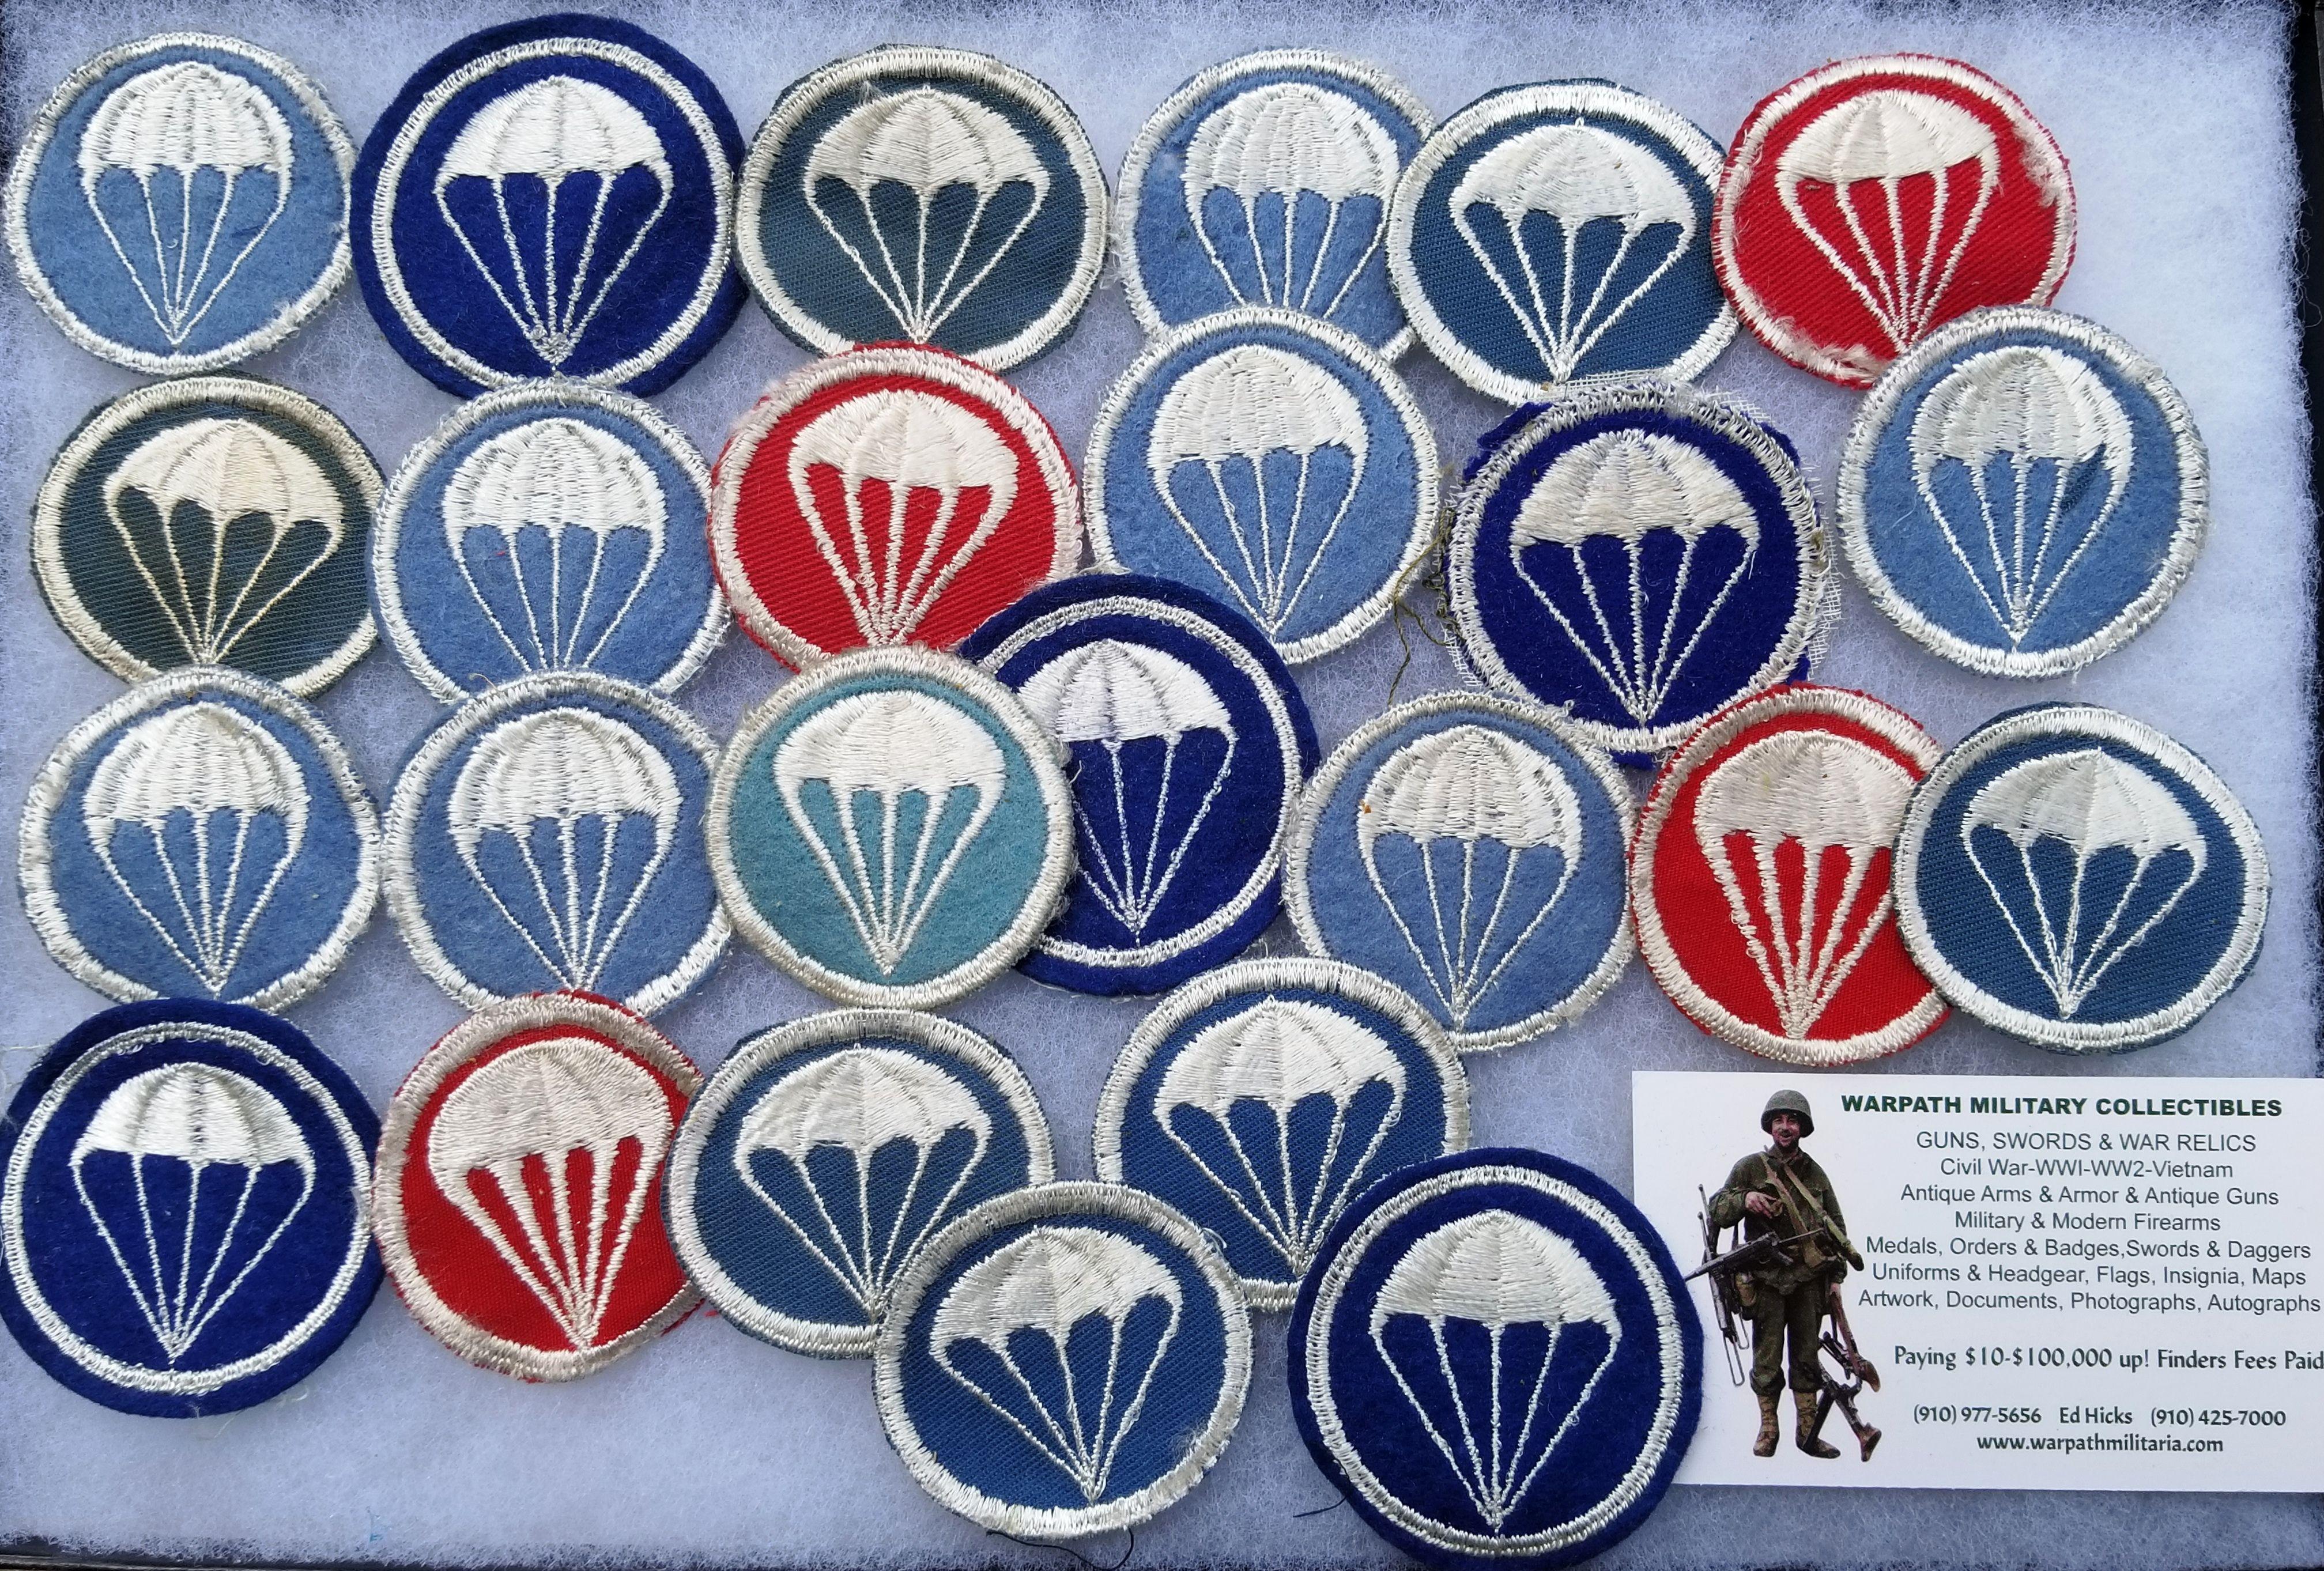 WWII US Army Airborne Paratrooper Cap Insignia www warpathmilitaria